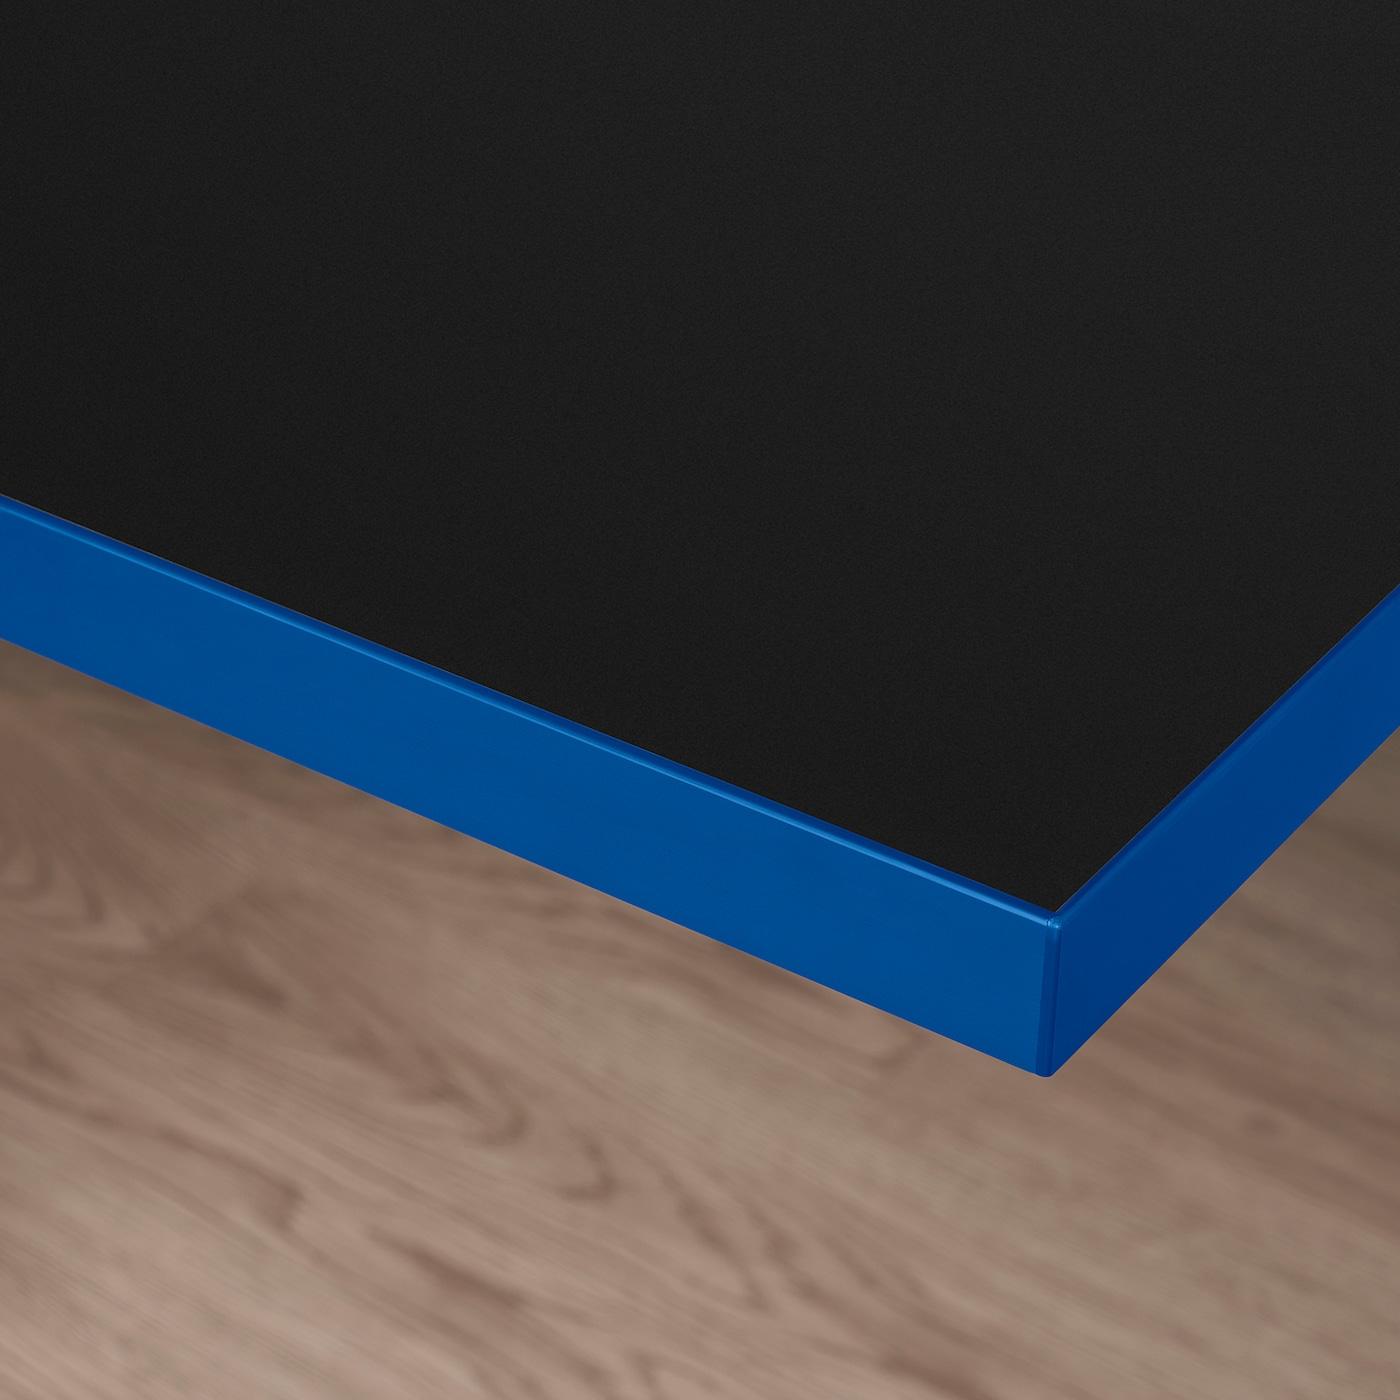 HUVUDSPELARE Table top, black/blue, 120x80 cm